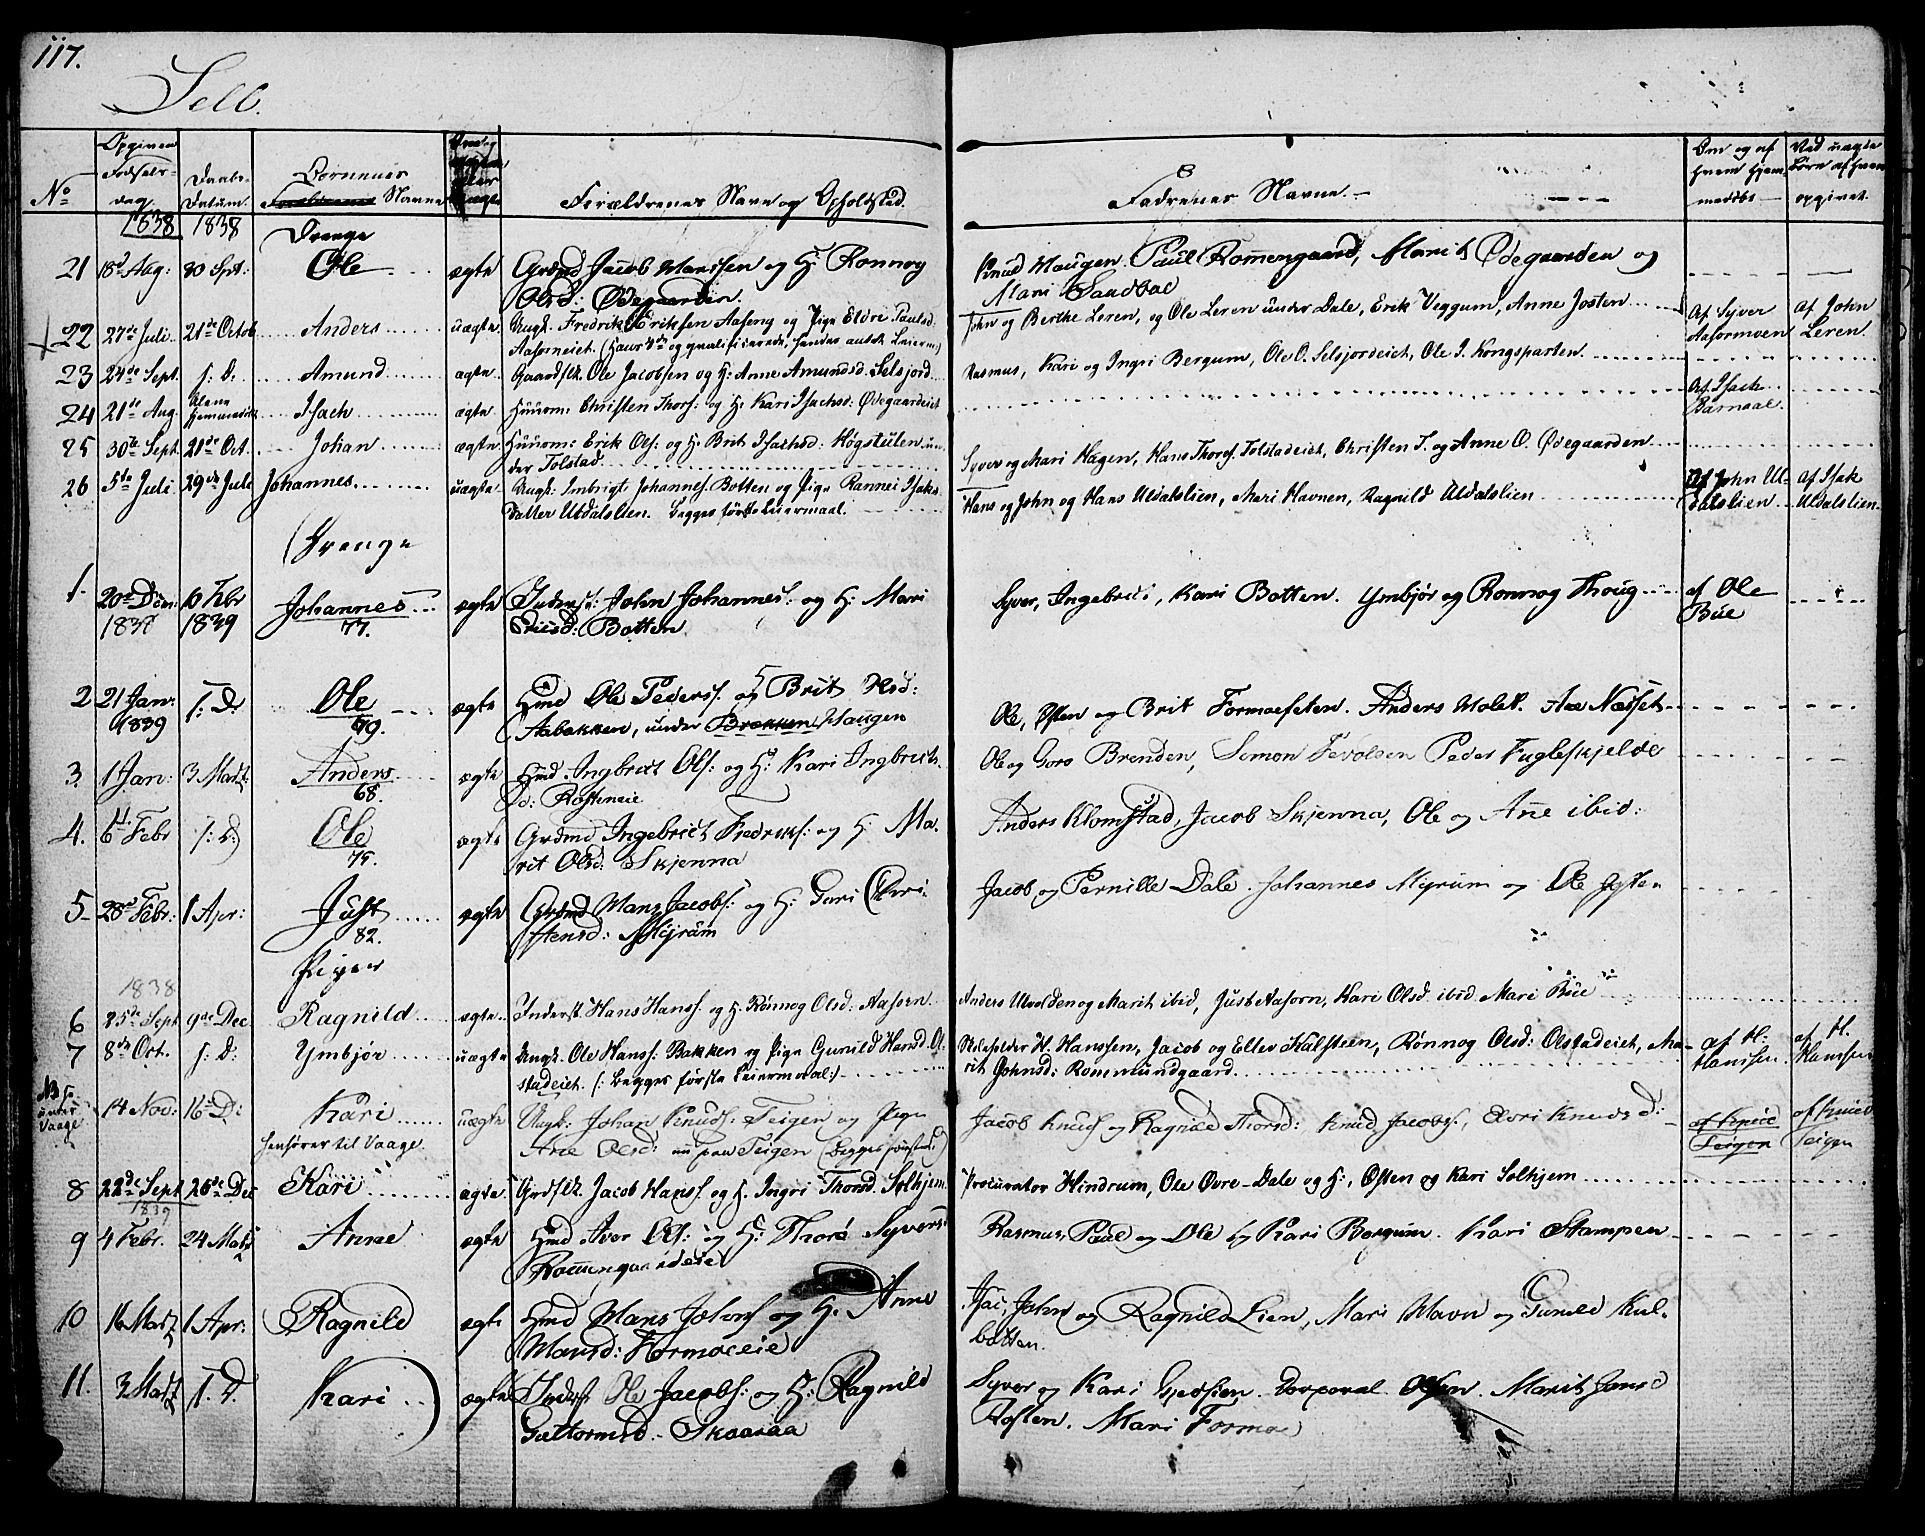 SAH, Vågå prestekontor, Ministerialbok nr. 4 /3, 1834-1842, s. 117